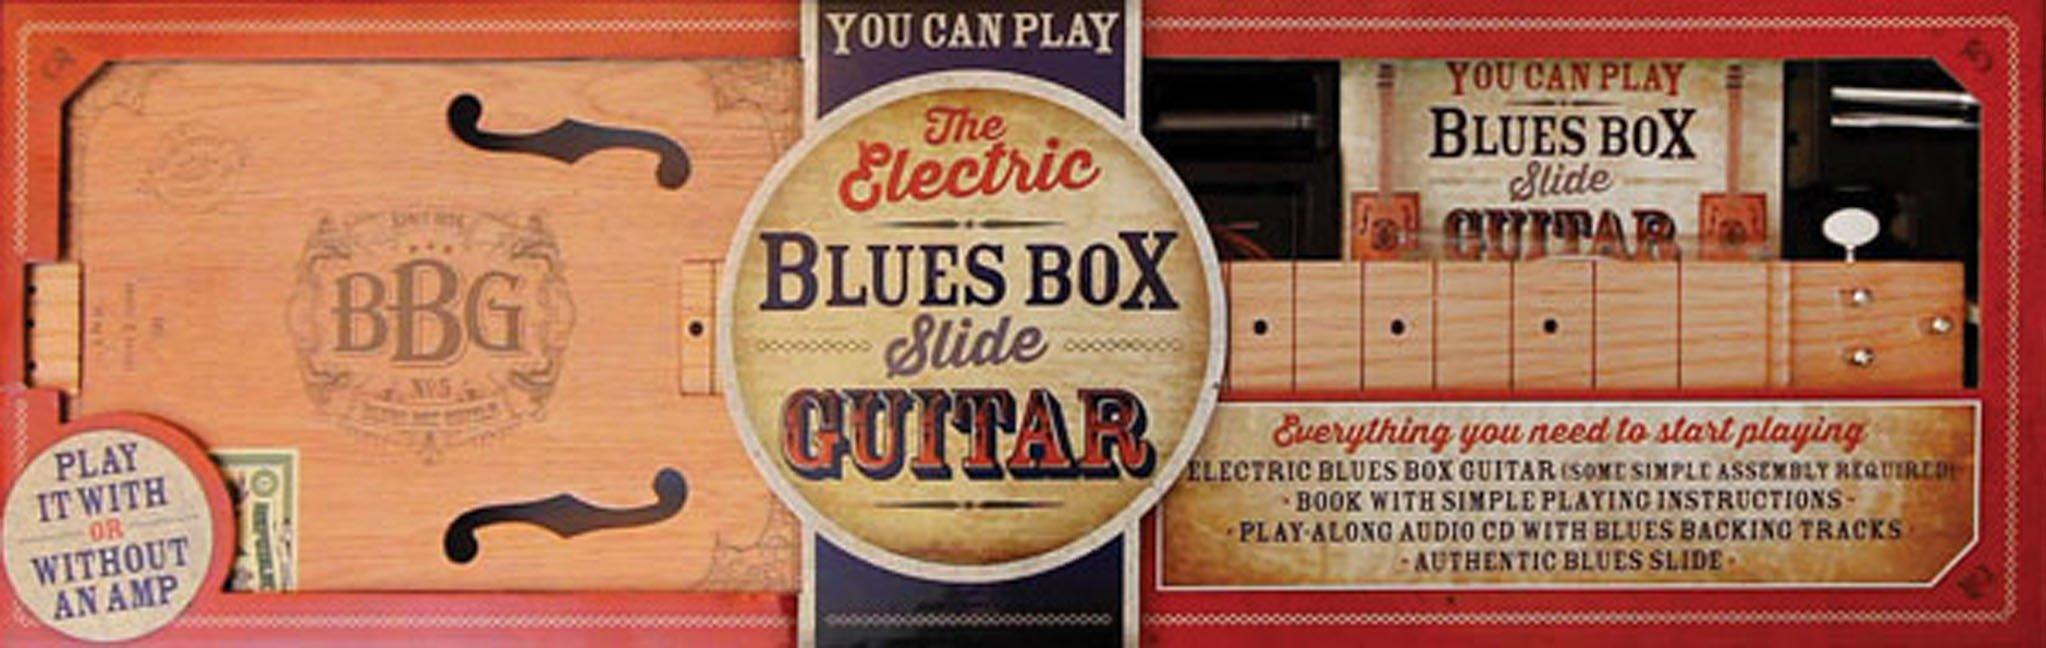 Electric Blues Box Slide Guitar Kit: Amazon.es: Nick Bryant: Libros en idiomas extranjeros